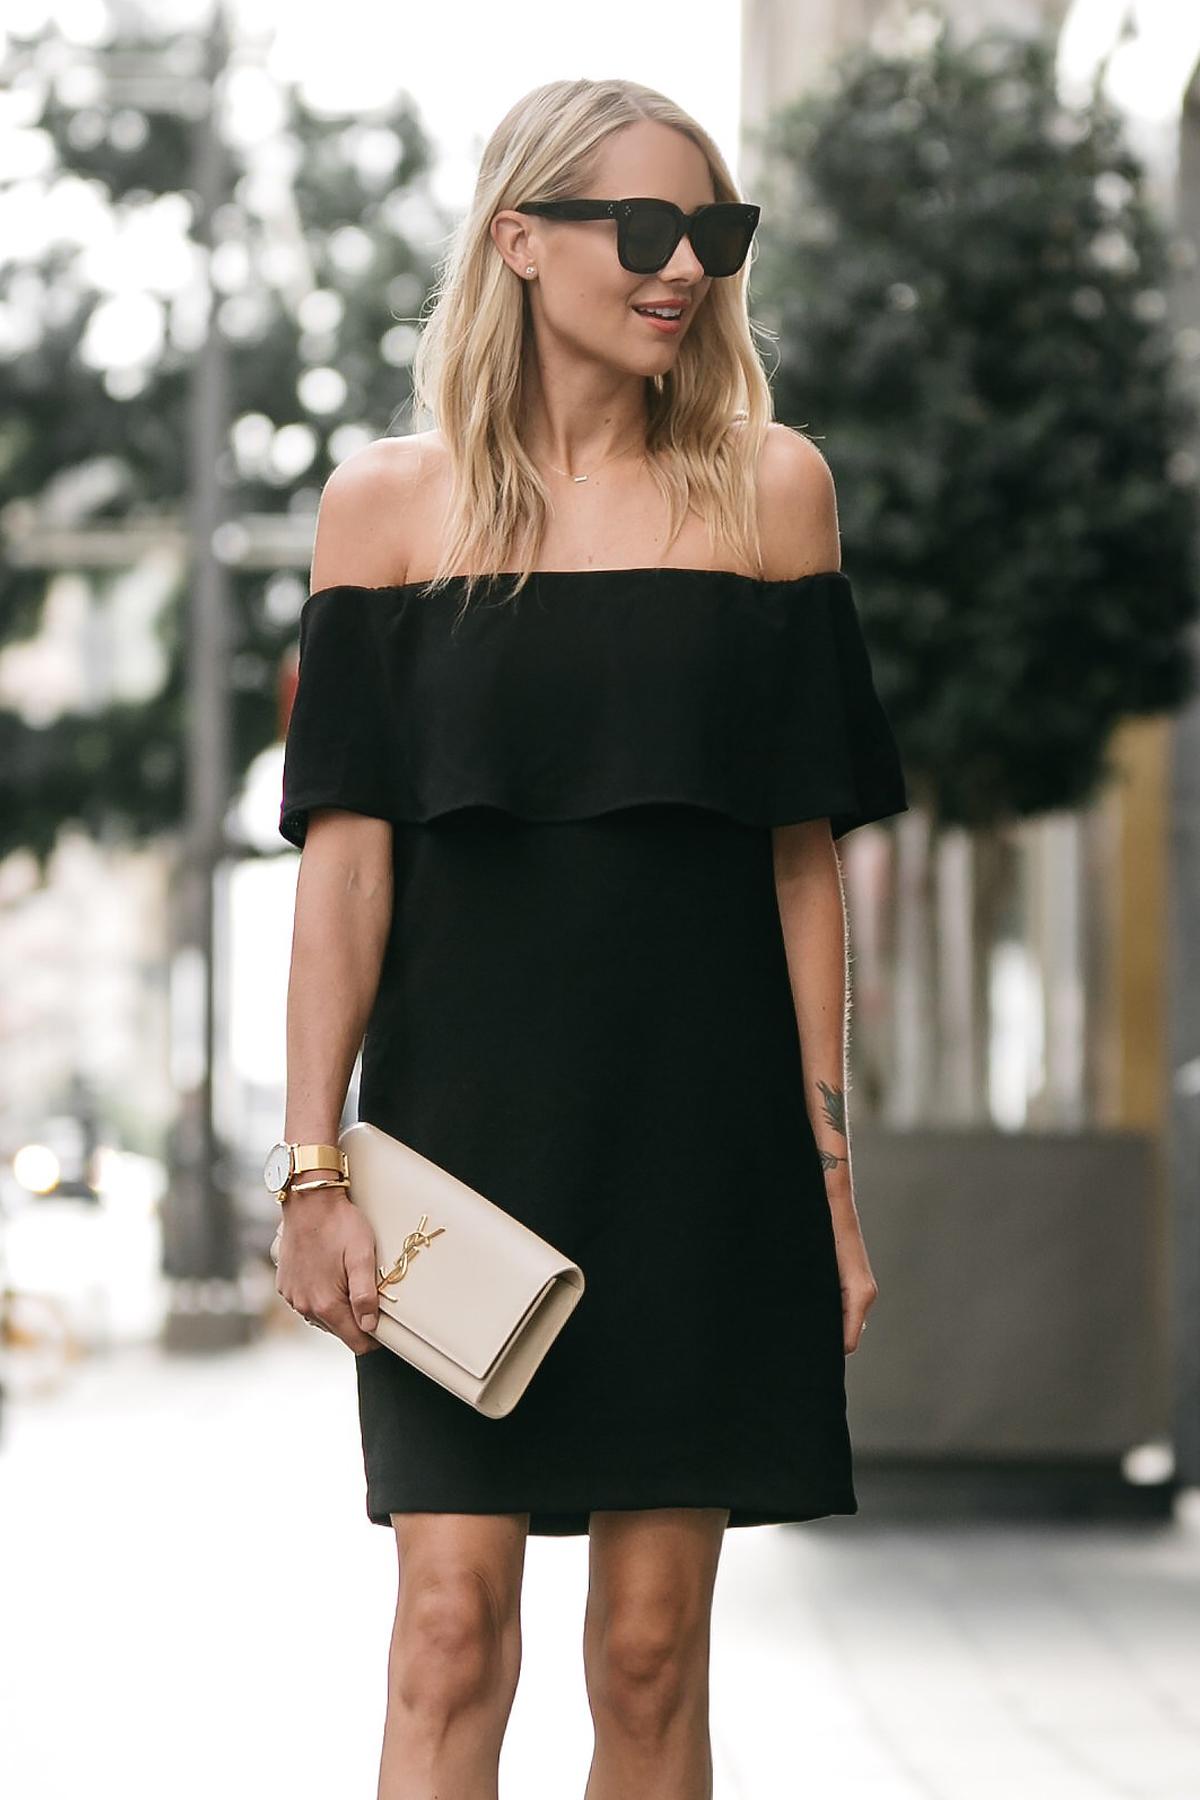 Blonde woman wearing Nordstrom off the shoulder black dress YSL nude clutch little black dress street style dallas blogger fashion blogger